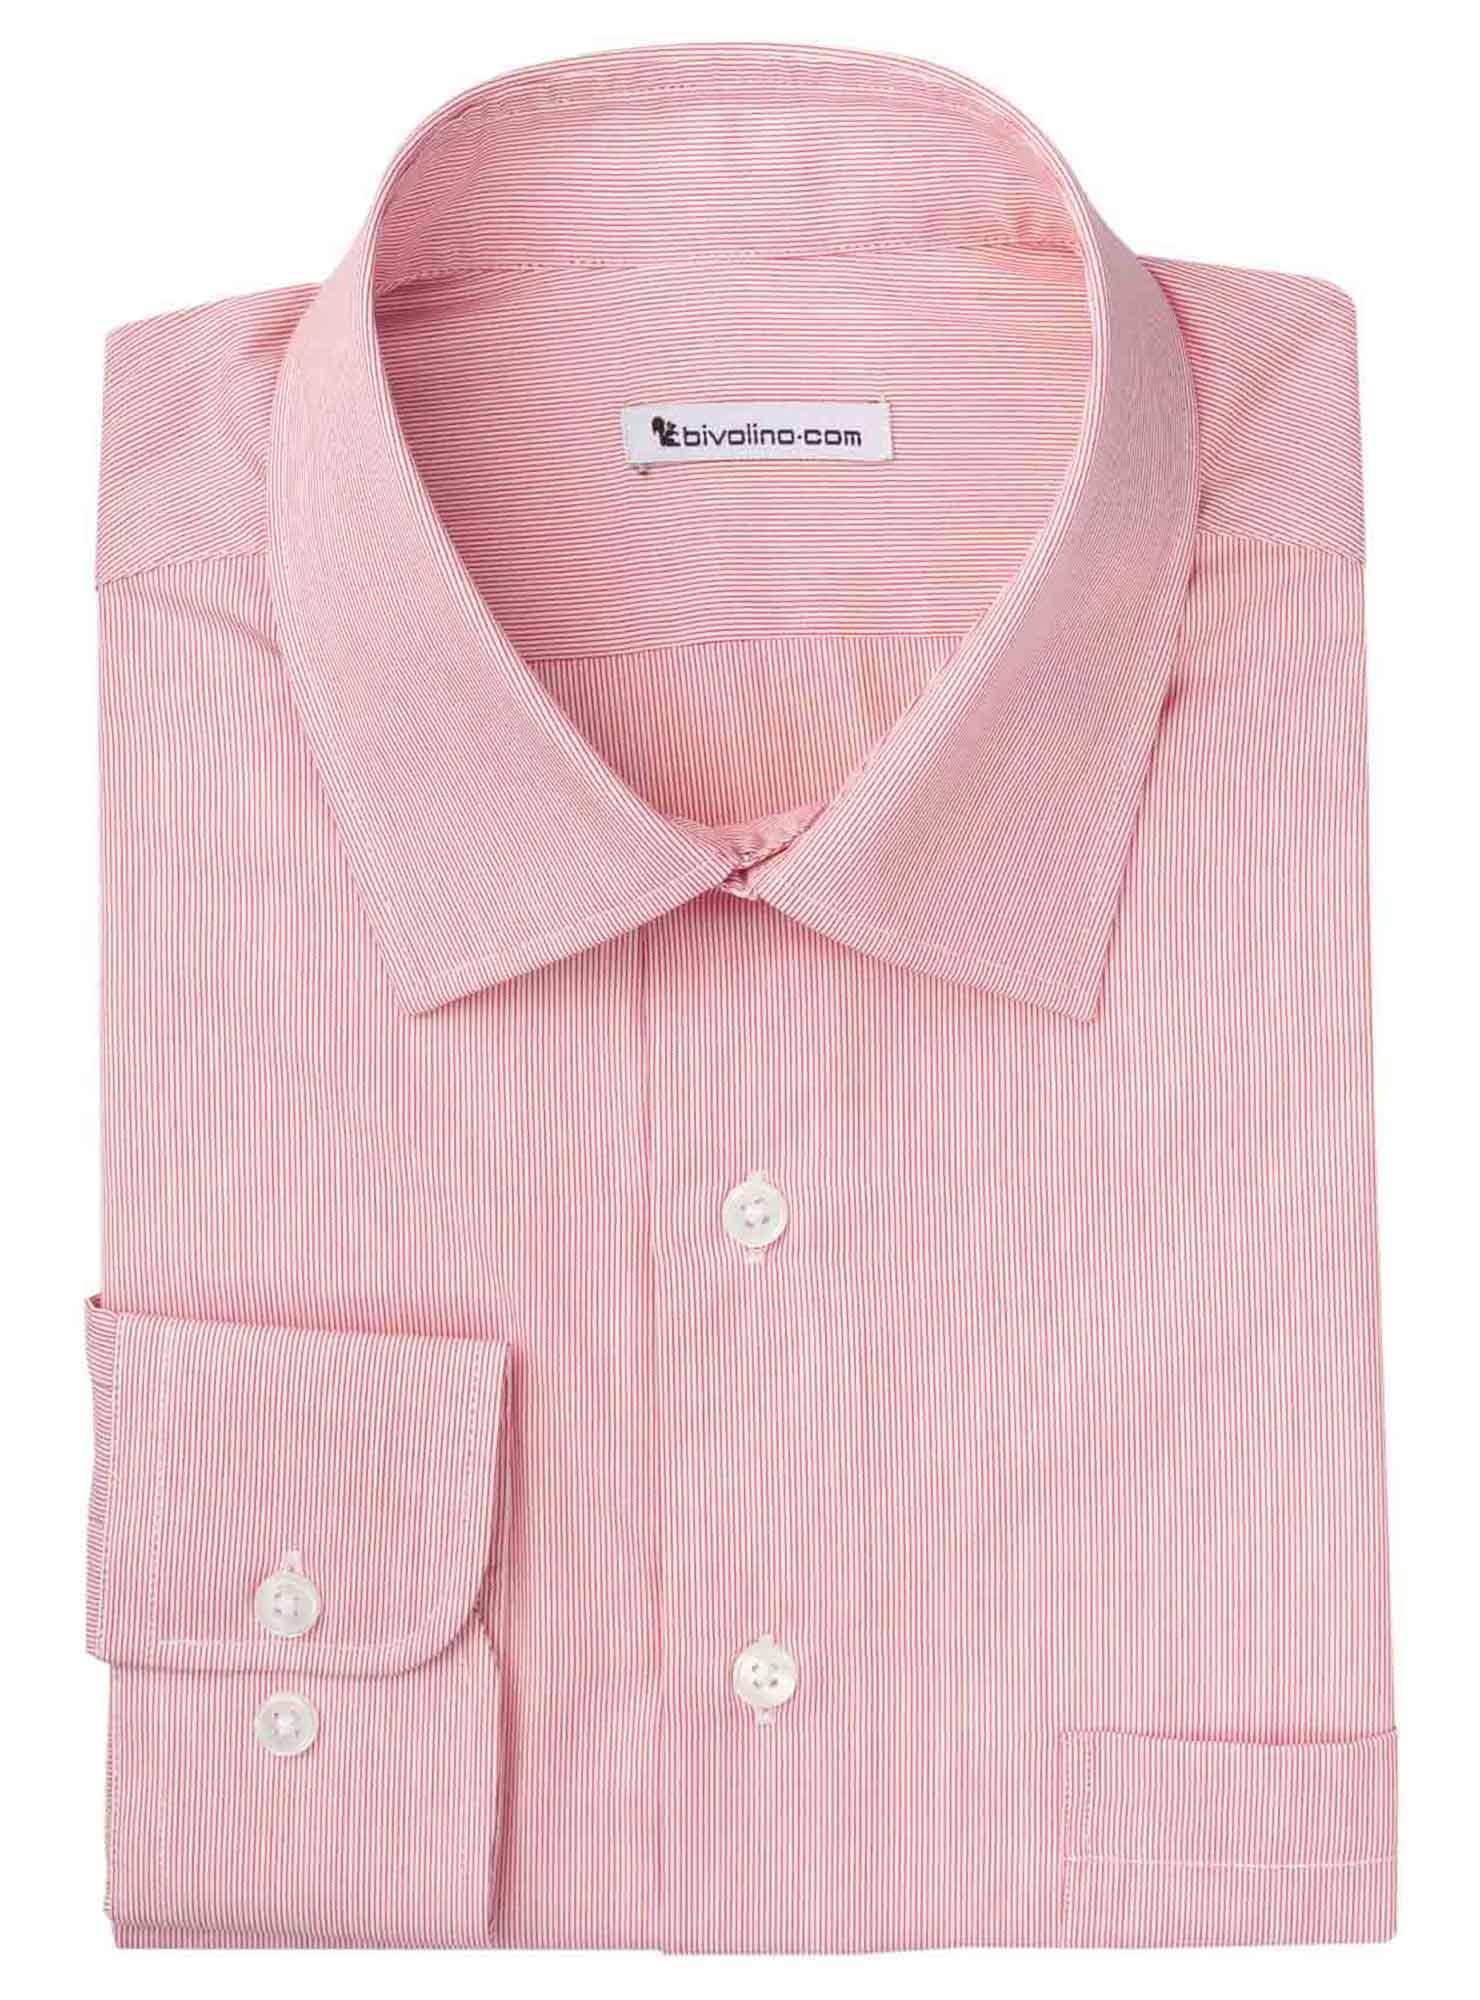 RANDUZZI - Men's shirt cotton red stripe - WINDY 4